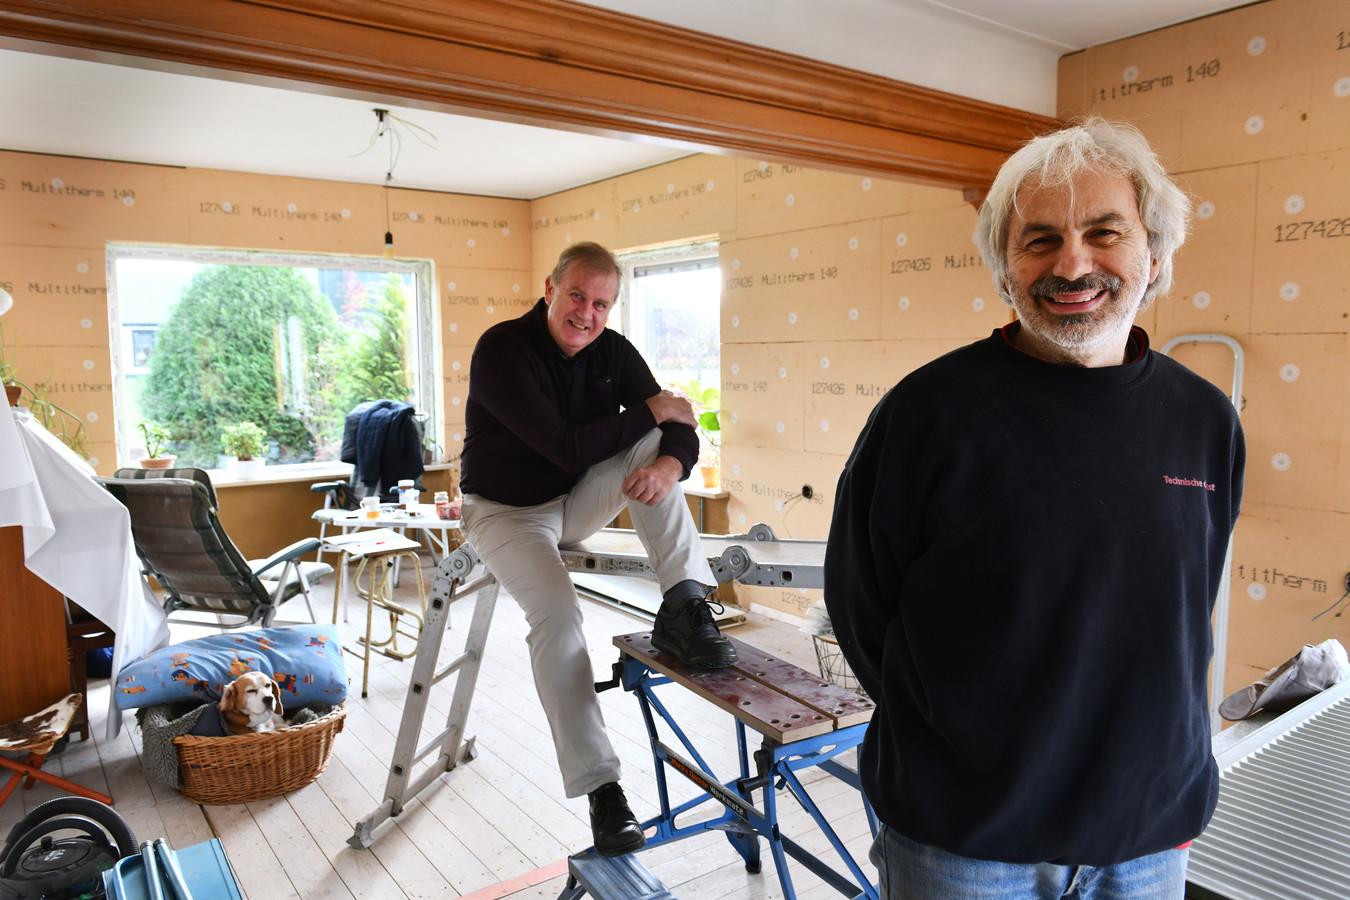 Samen werken in groen energie Jan (wiite broek) en Andries.